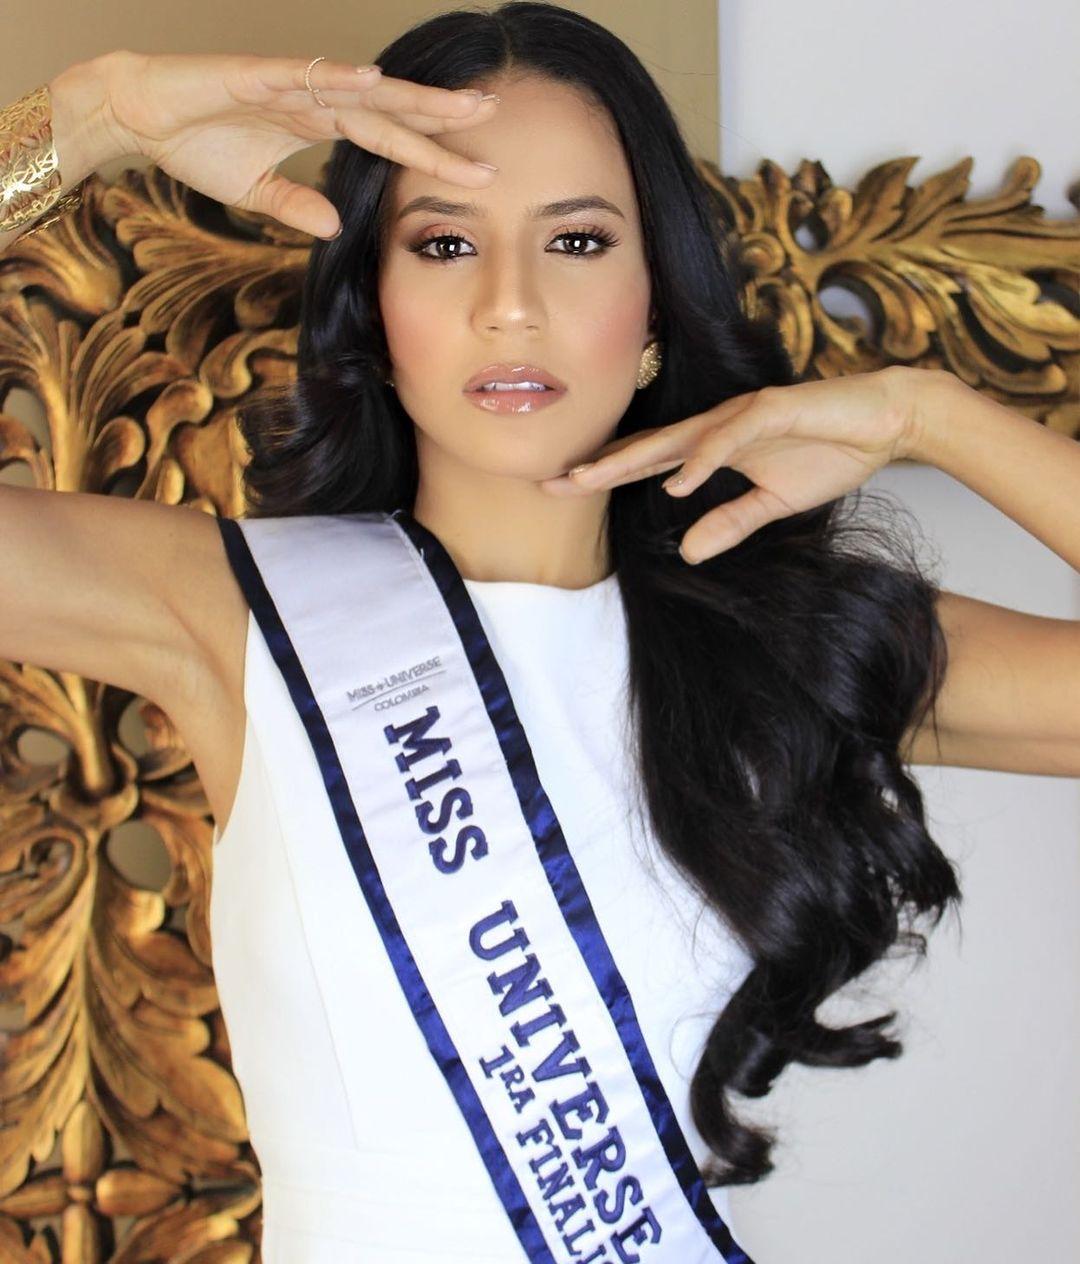 jennifer pulgarin, 1st runner-up de miss universe colombia 2020. 21967013